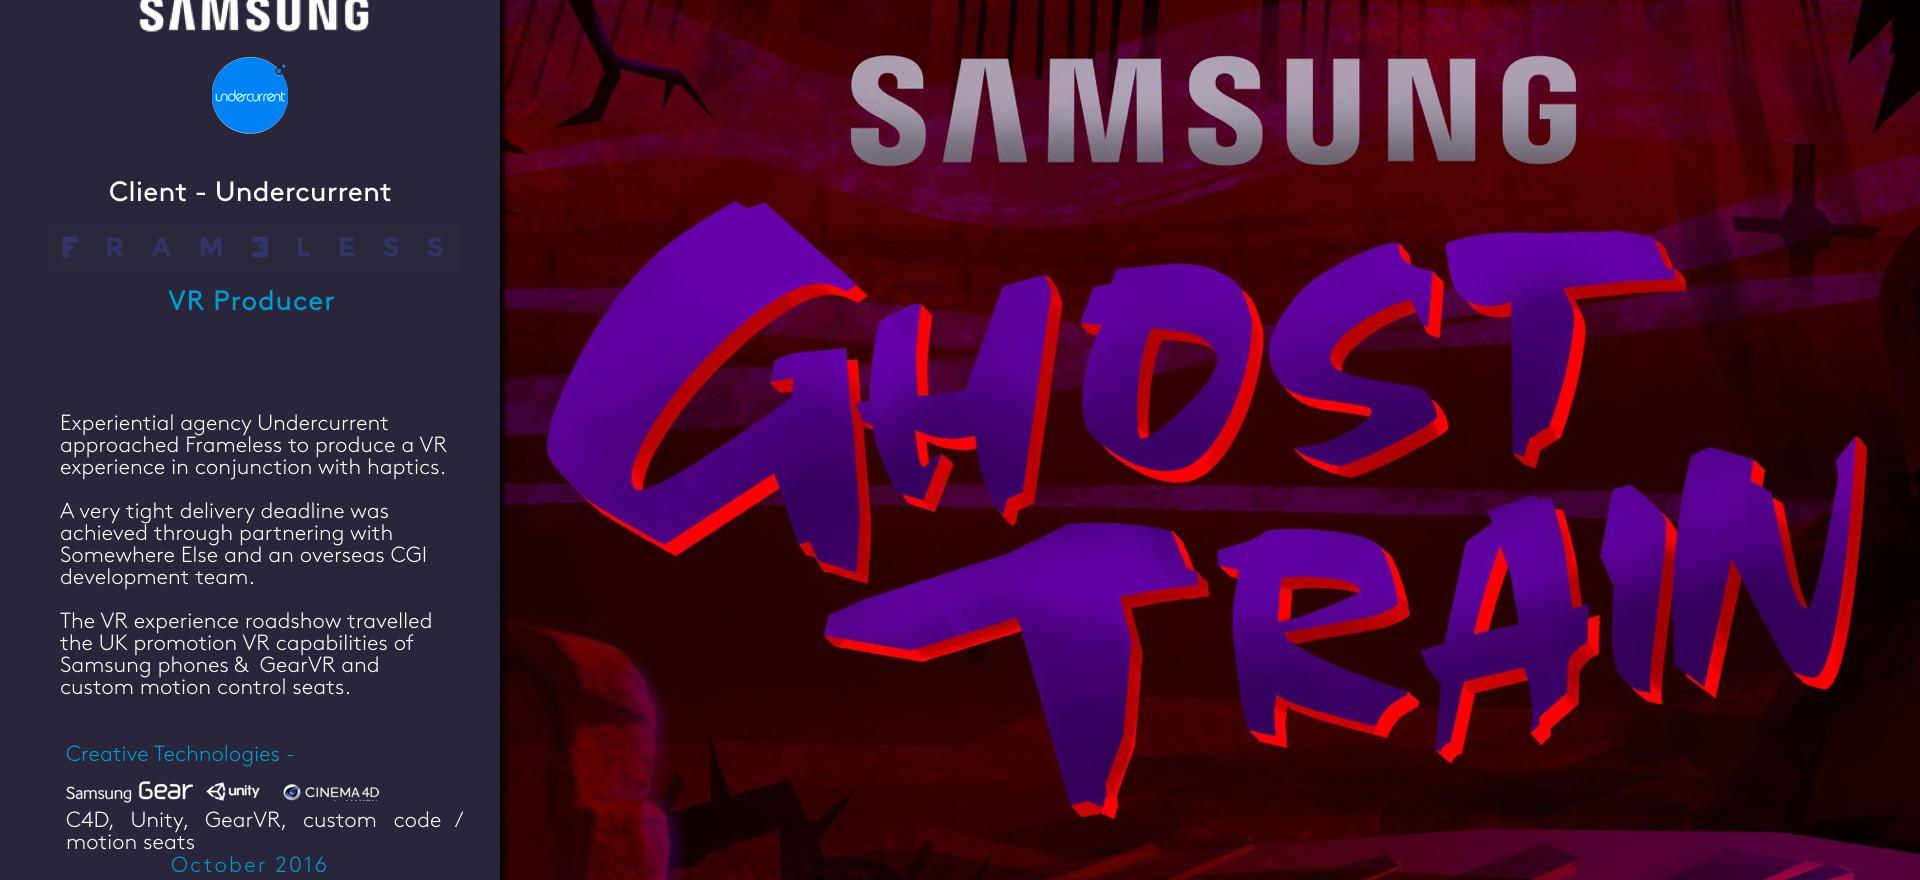 Samsung - Ghost Train 360